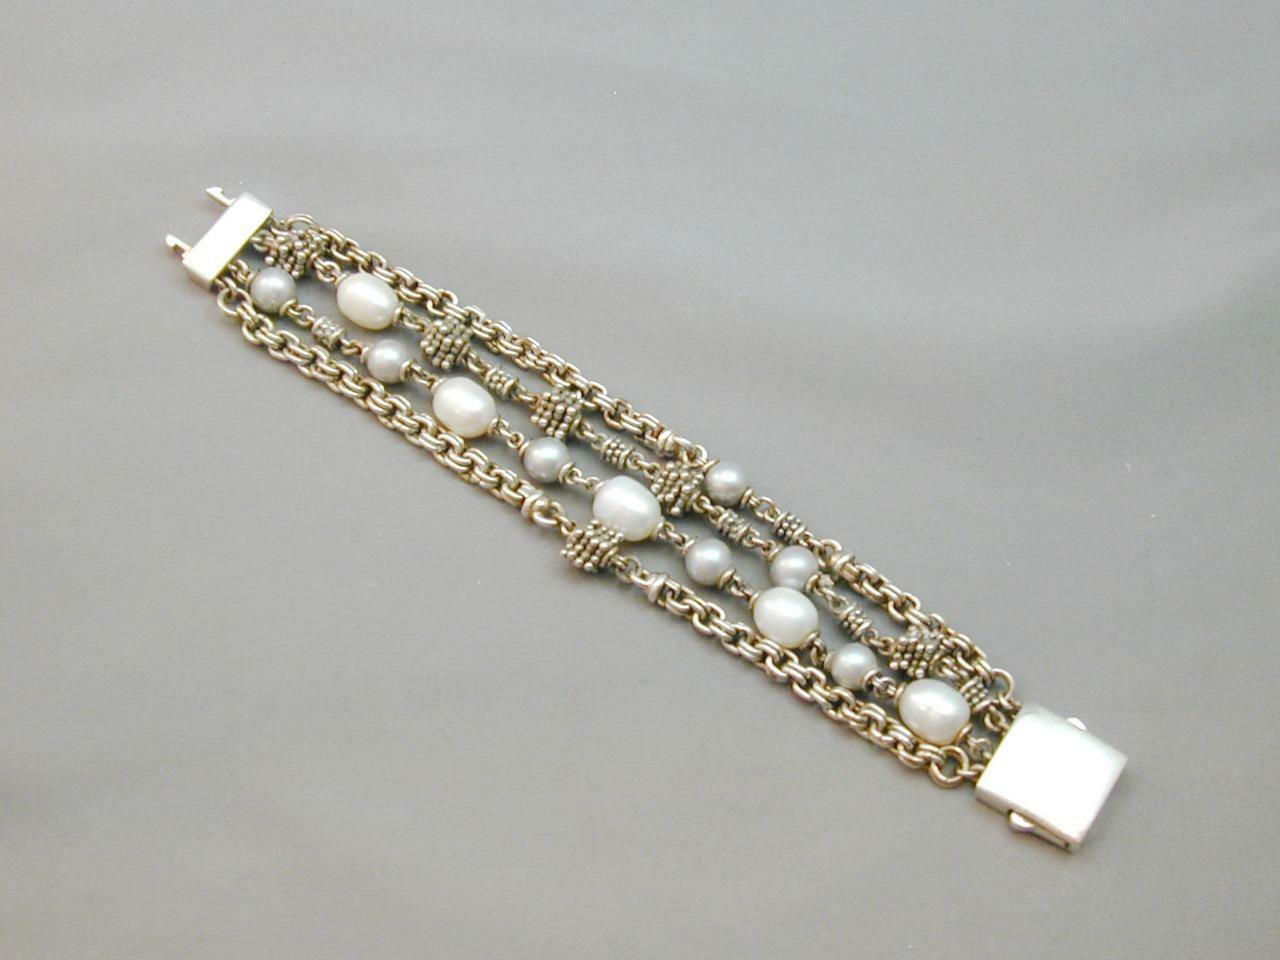 Michael Dawkins 4 Strand 925 Granulation Bead Gray White FW Pearl Bracelet